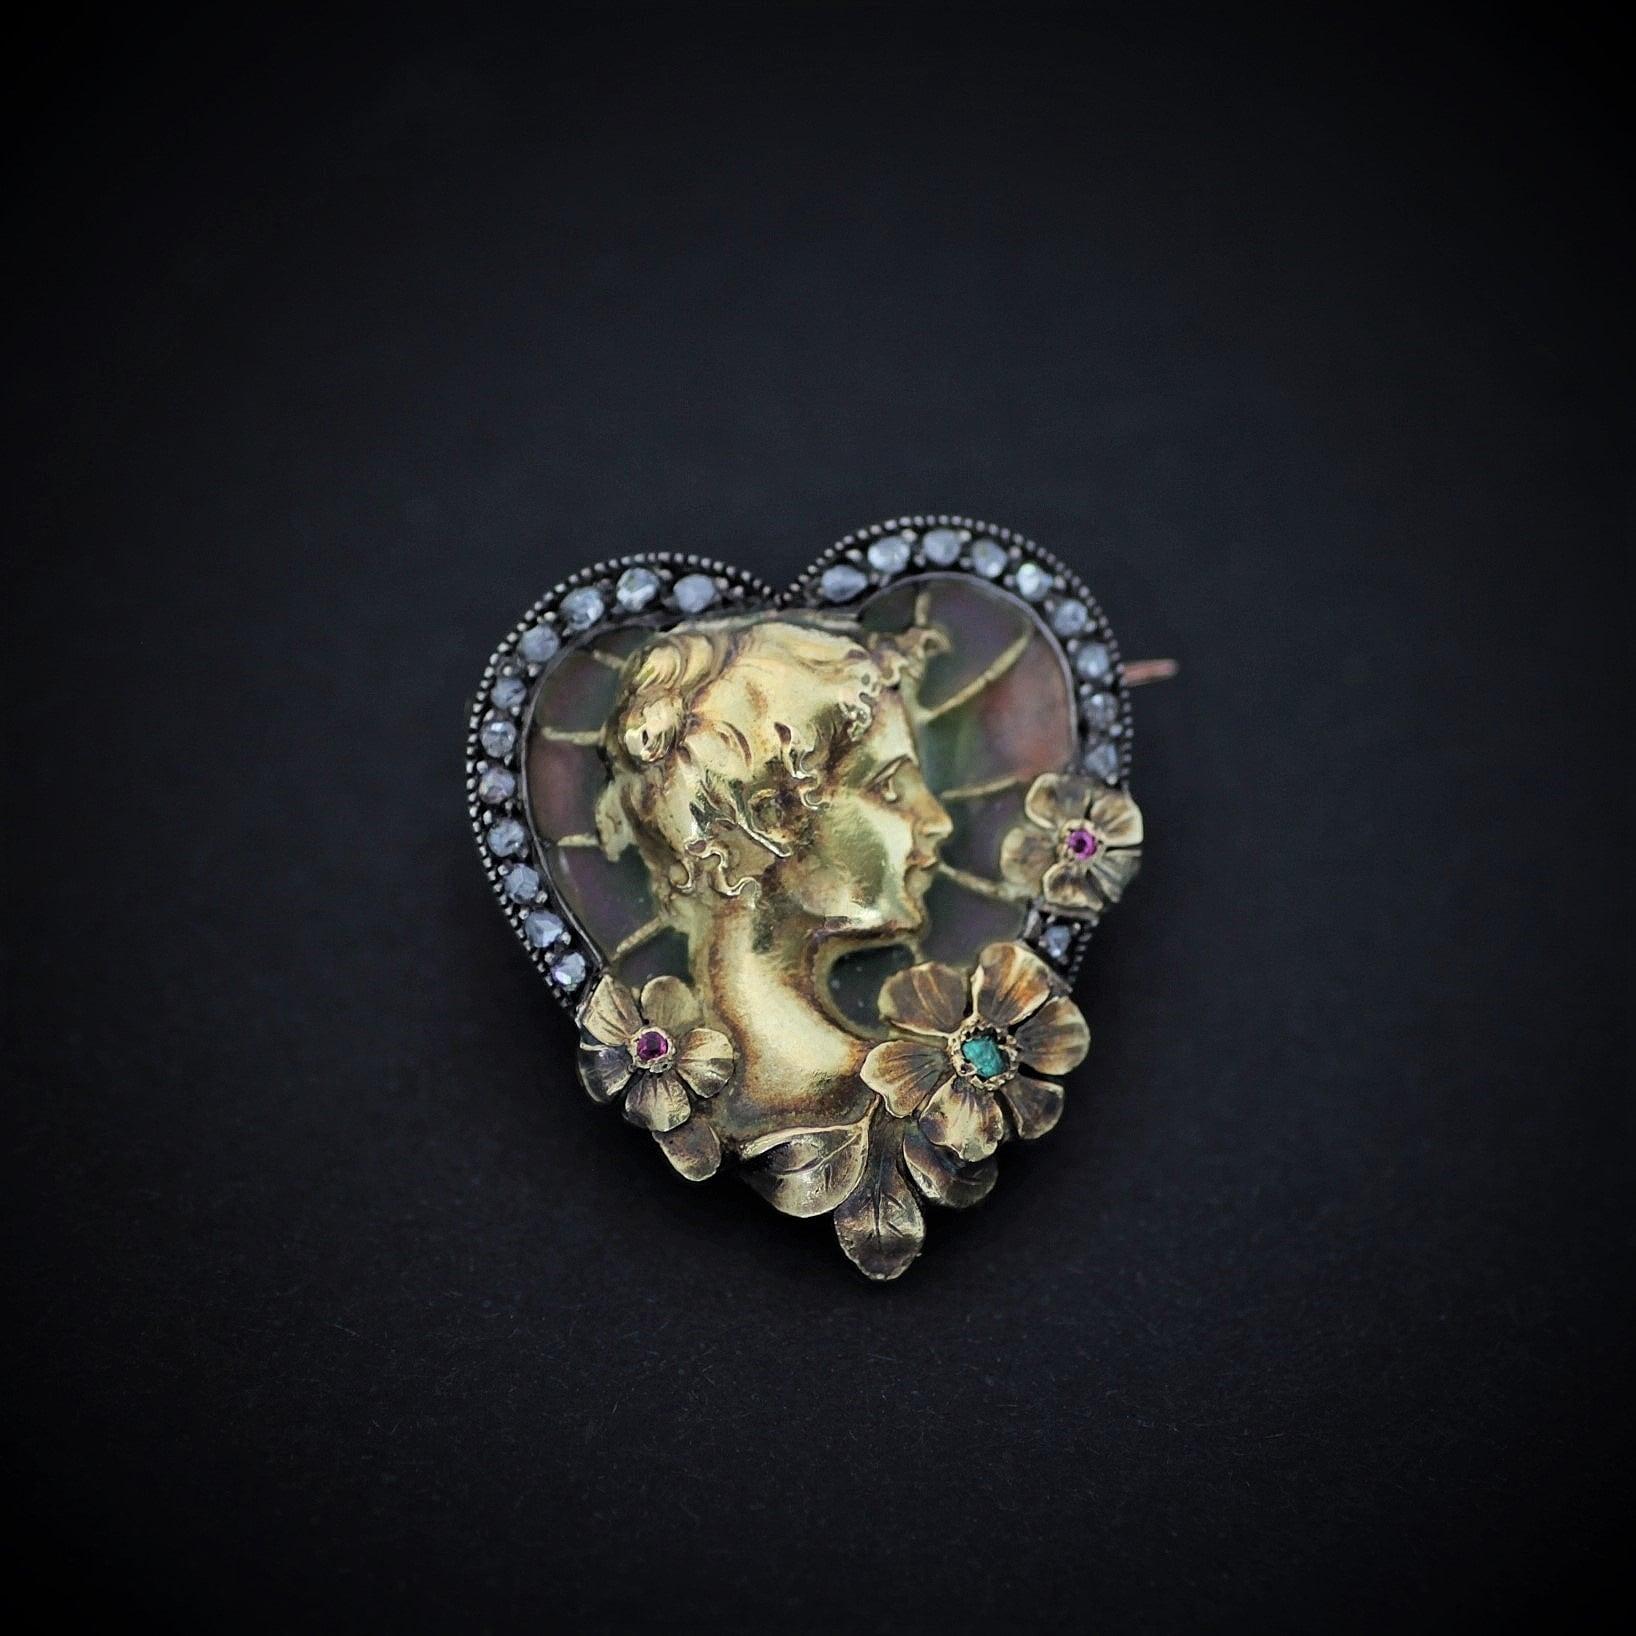 Art-Nouveau Plique a jour enamel brooch アール・ヌーヴォー プリカジュールエナメル ブローチ